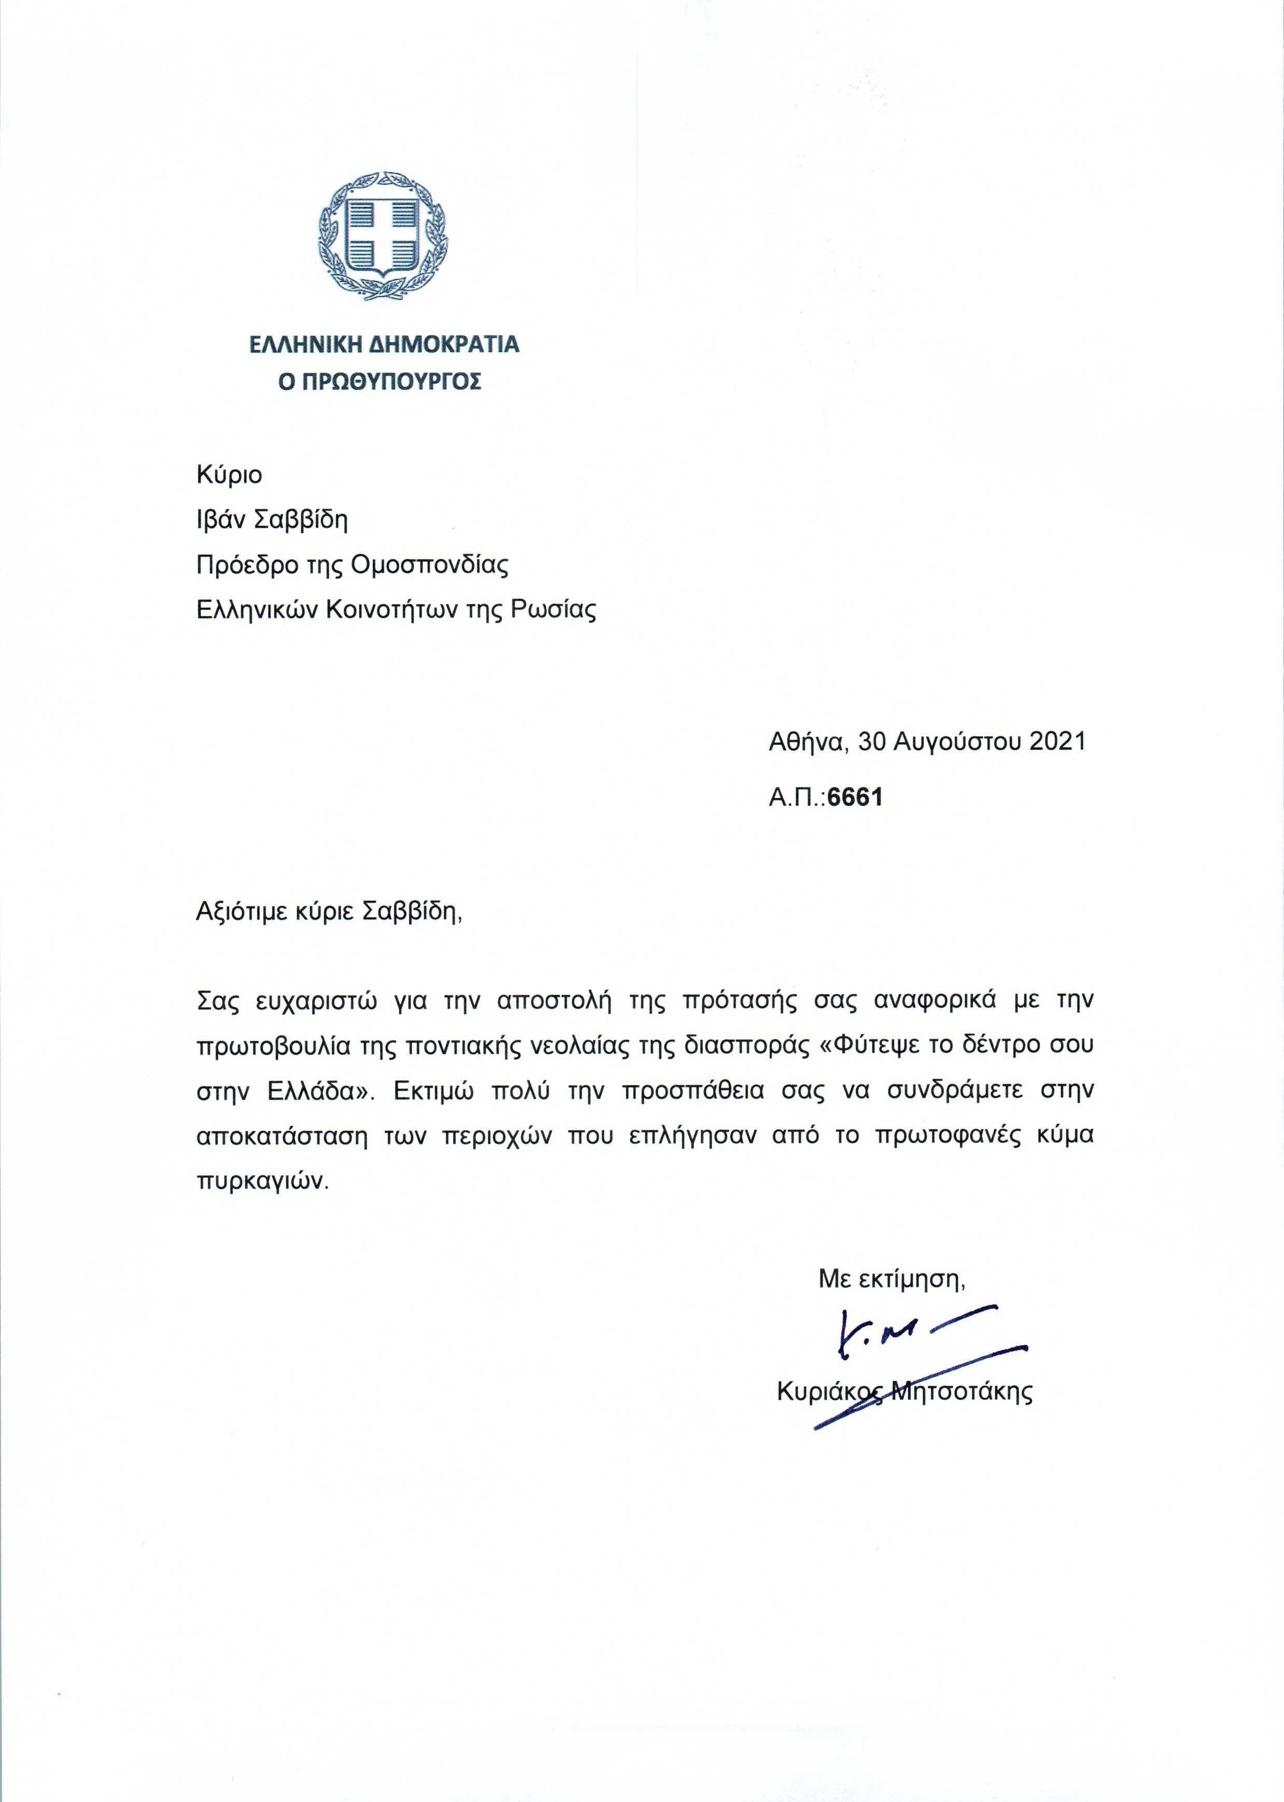 Кириакос Мицотакис поблагодарил Ивана Саввиди за инициативу